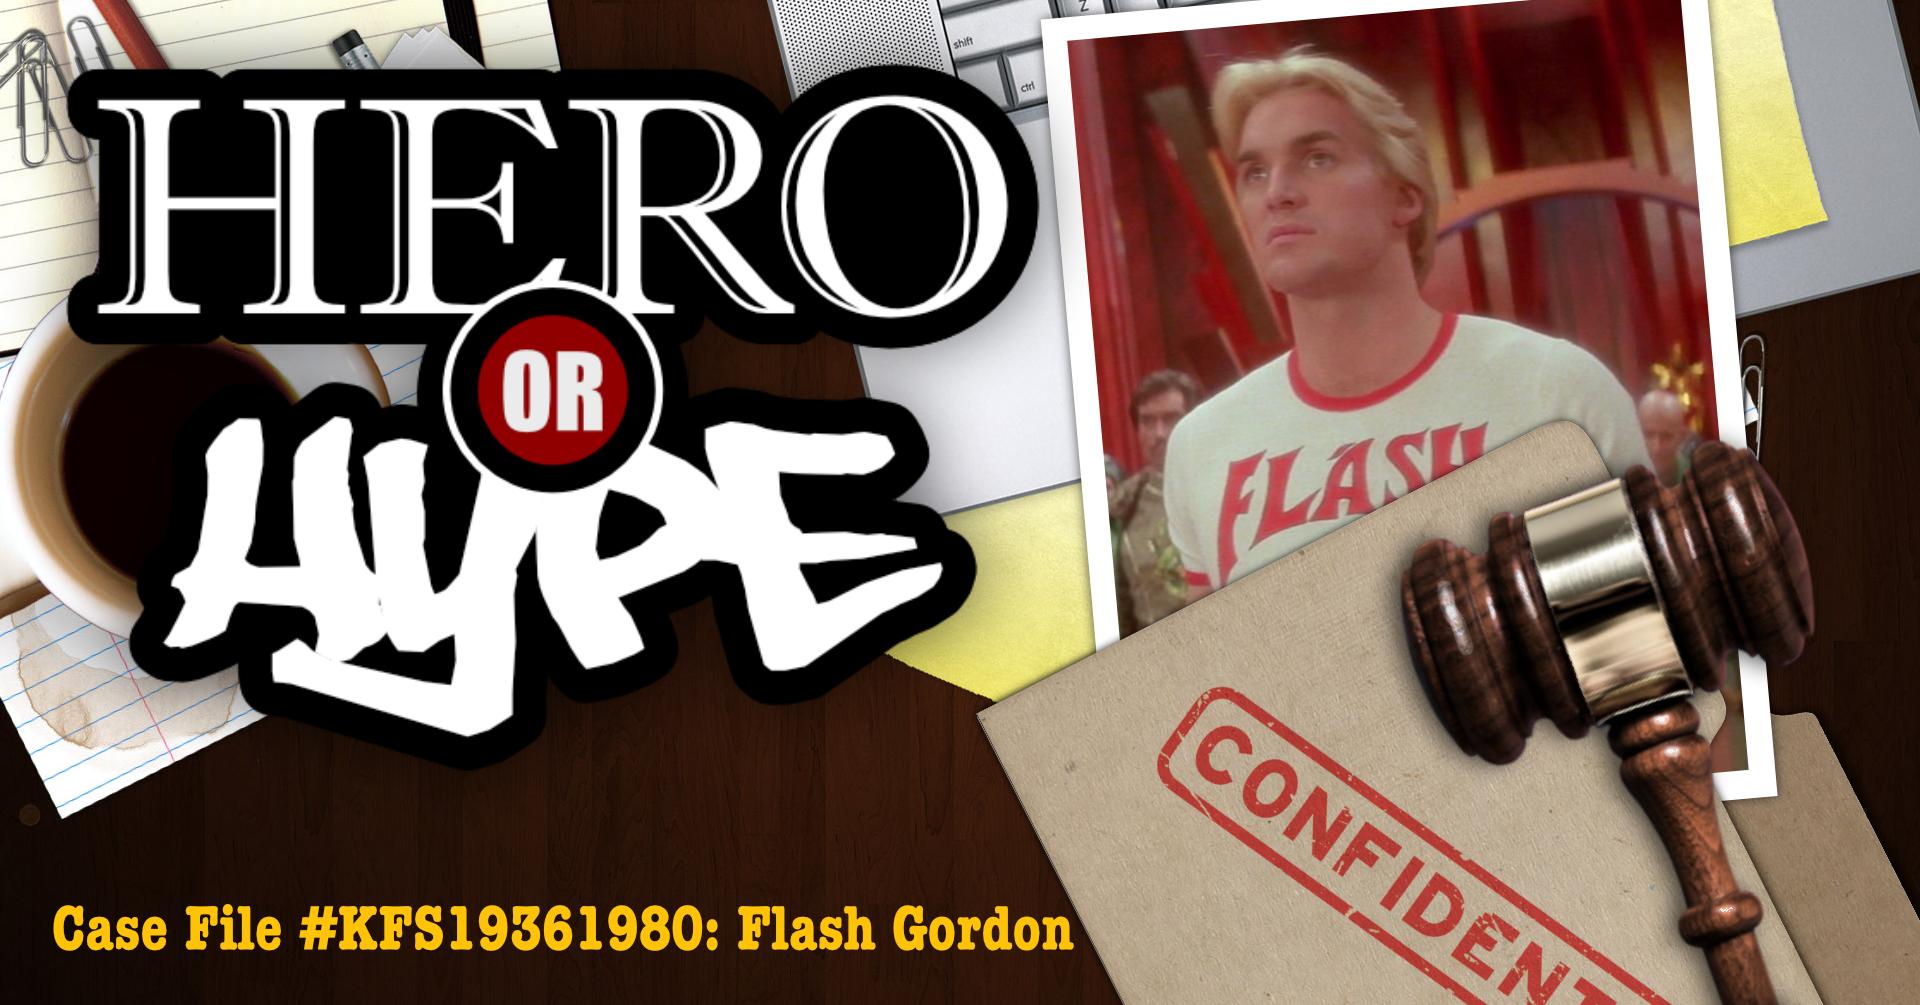 Hero or Hype? Flash Gordon